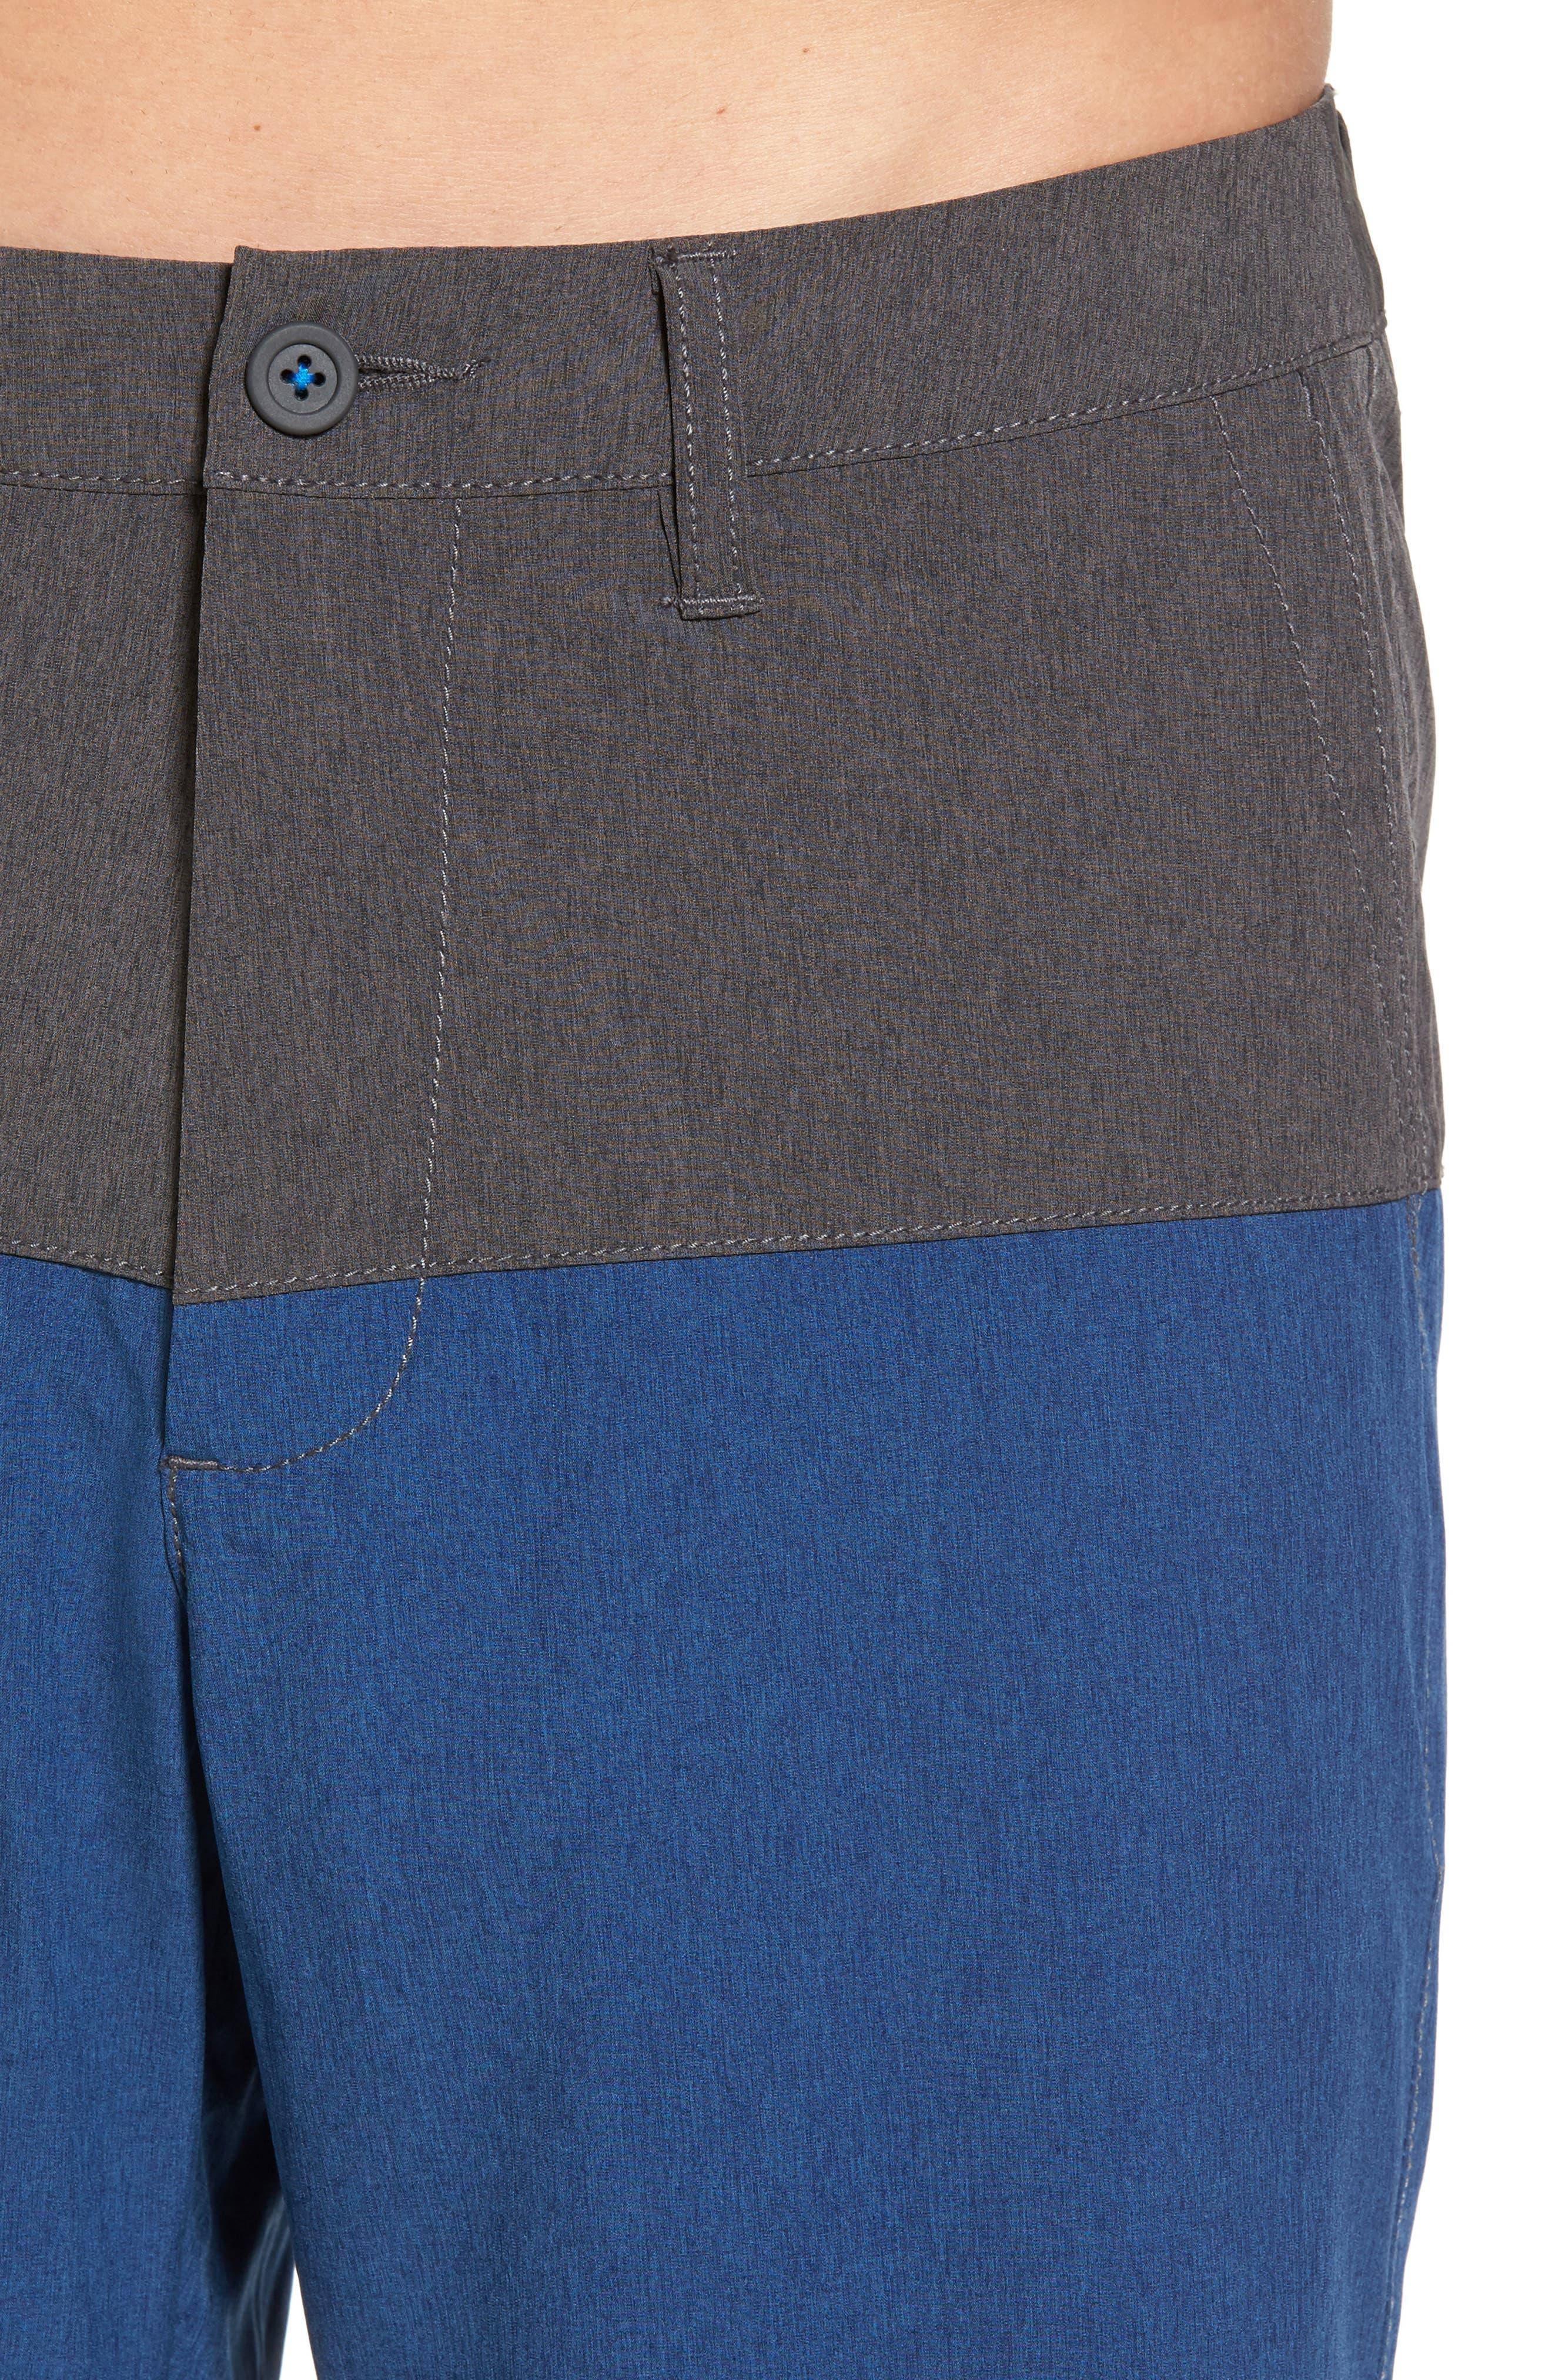 Cayman Block & Roll Hybrid Swim Shorts,                             Alternate thumbnail 4, color,                             Deep Marine